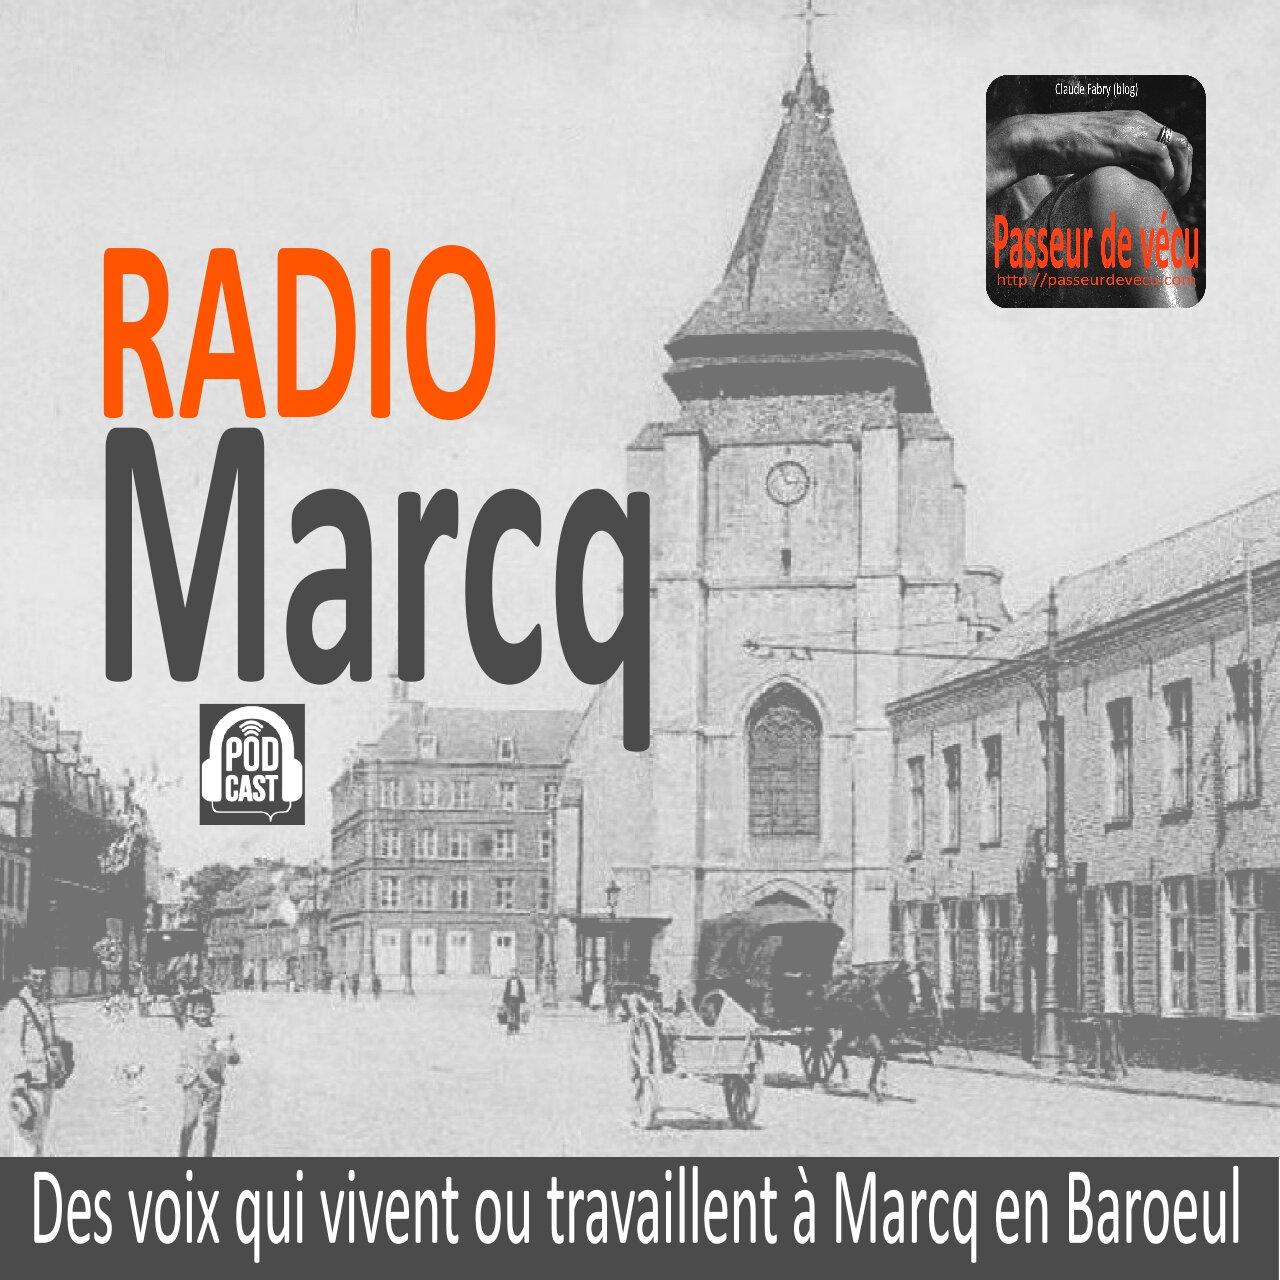 Radiomarcq